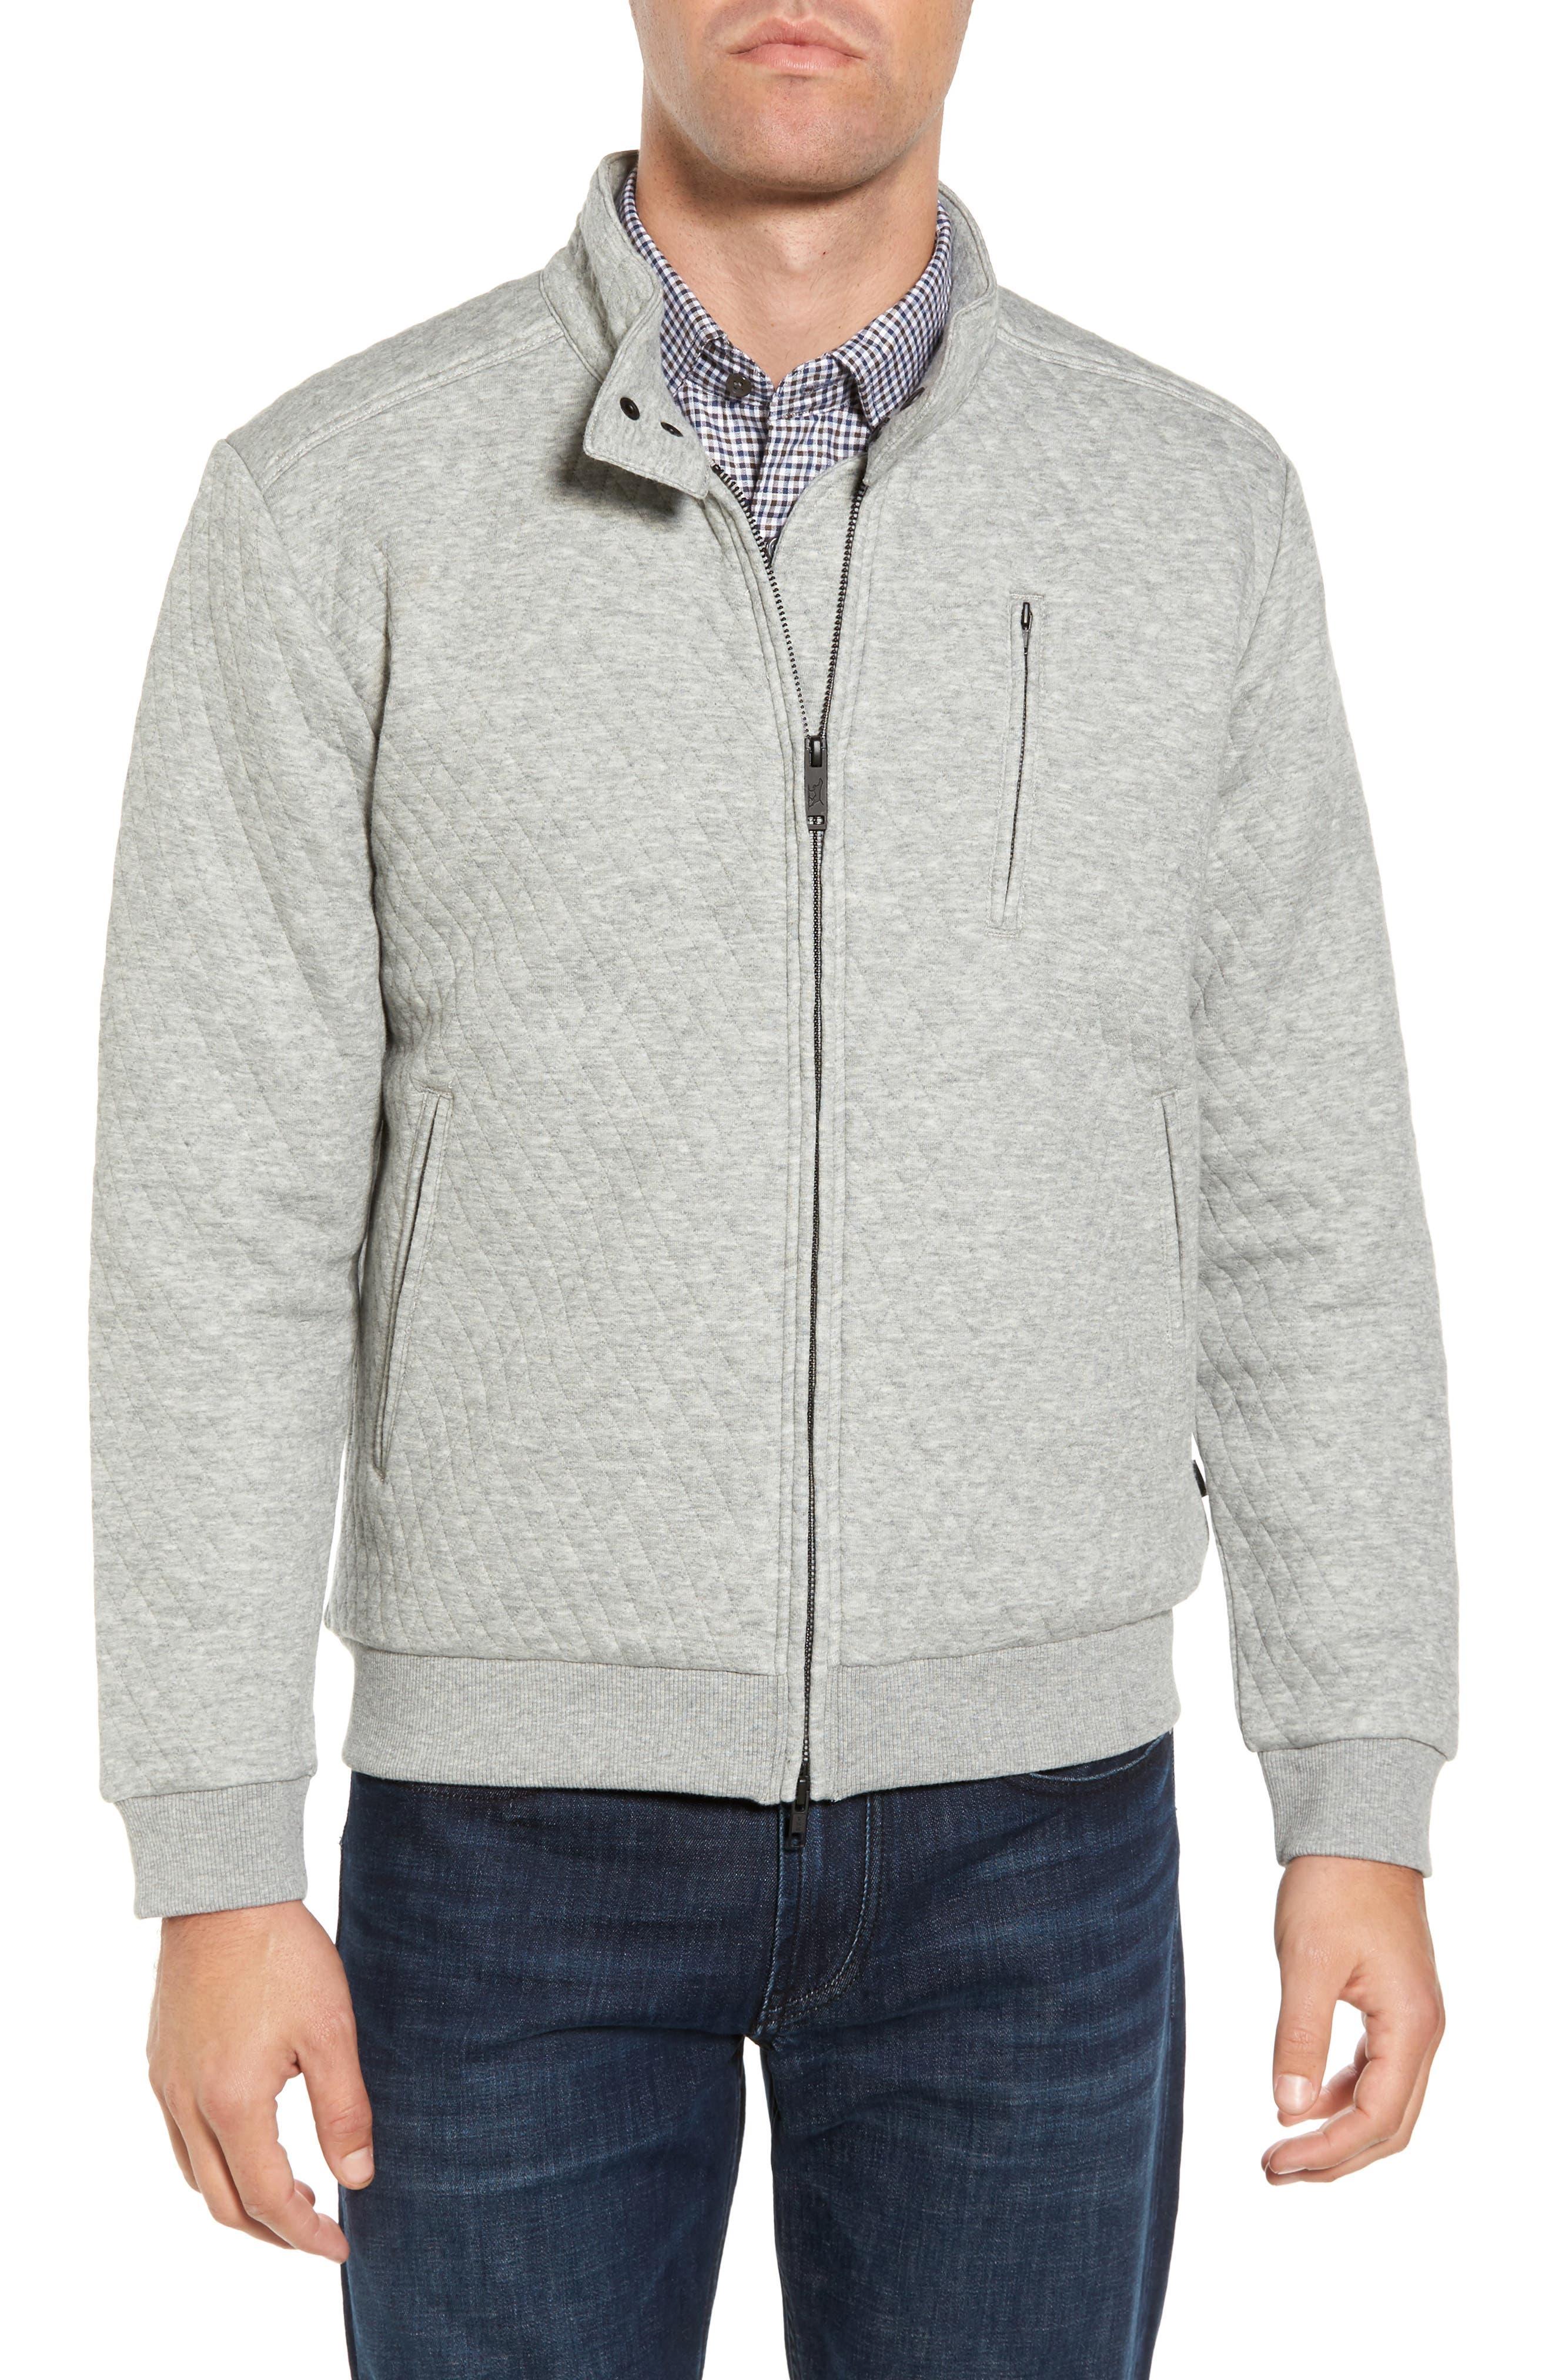 RODD & GUNN Skipjack Pass Quilted Fleece Jacket, Main, color, ASH